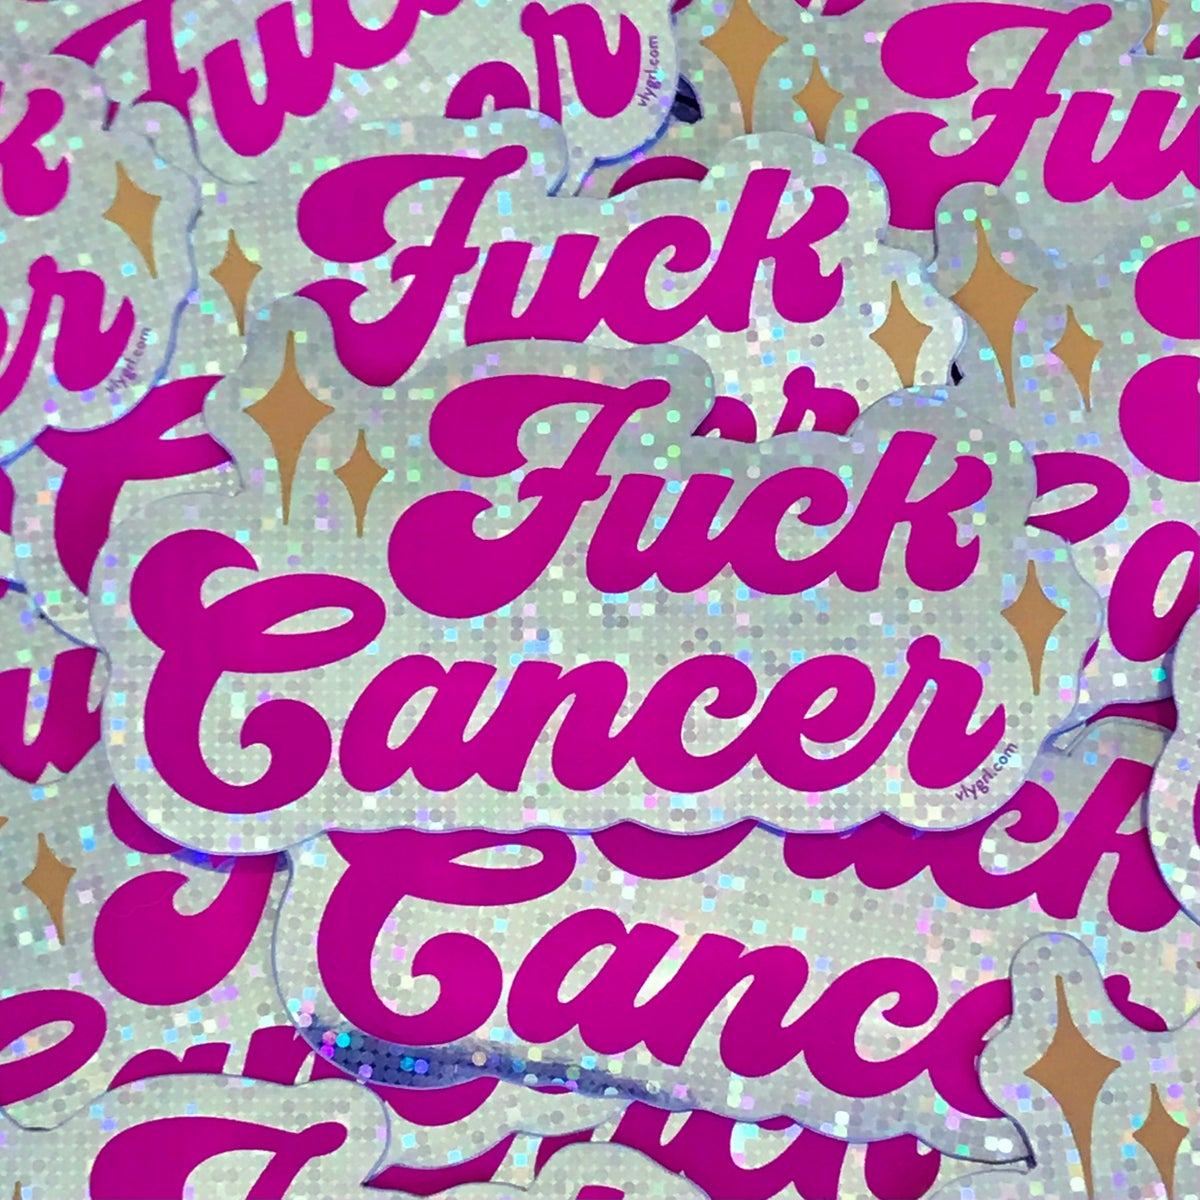 Image of Fuck Cancer Glitter Sticker